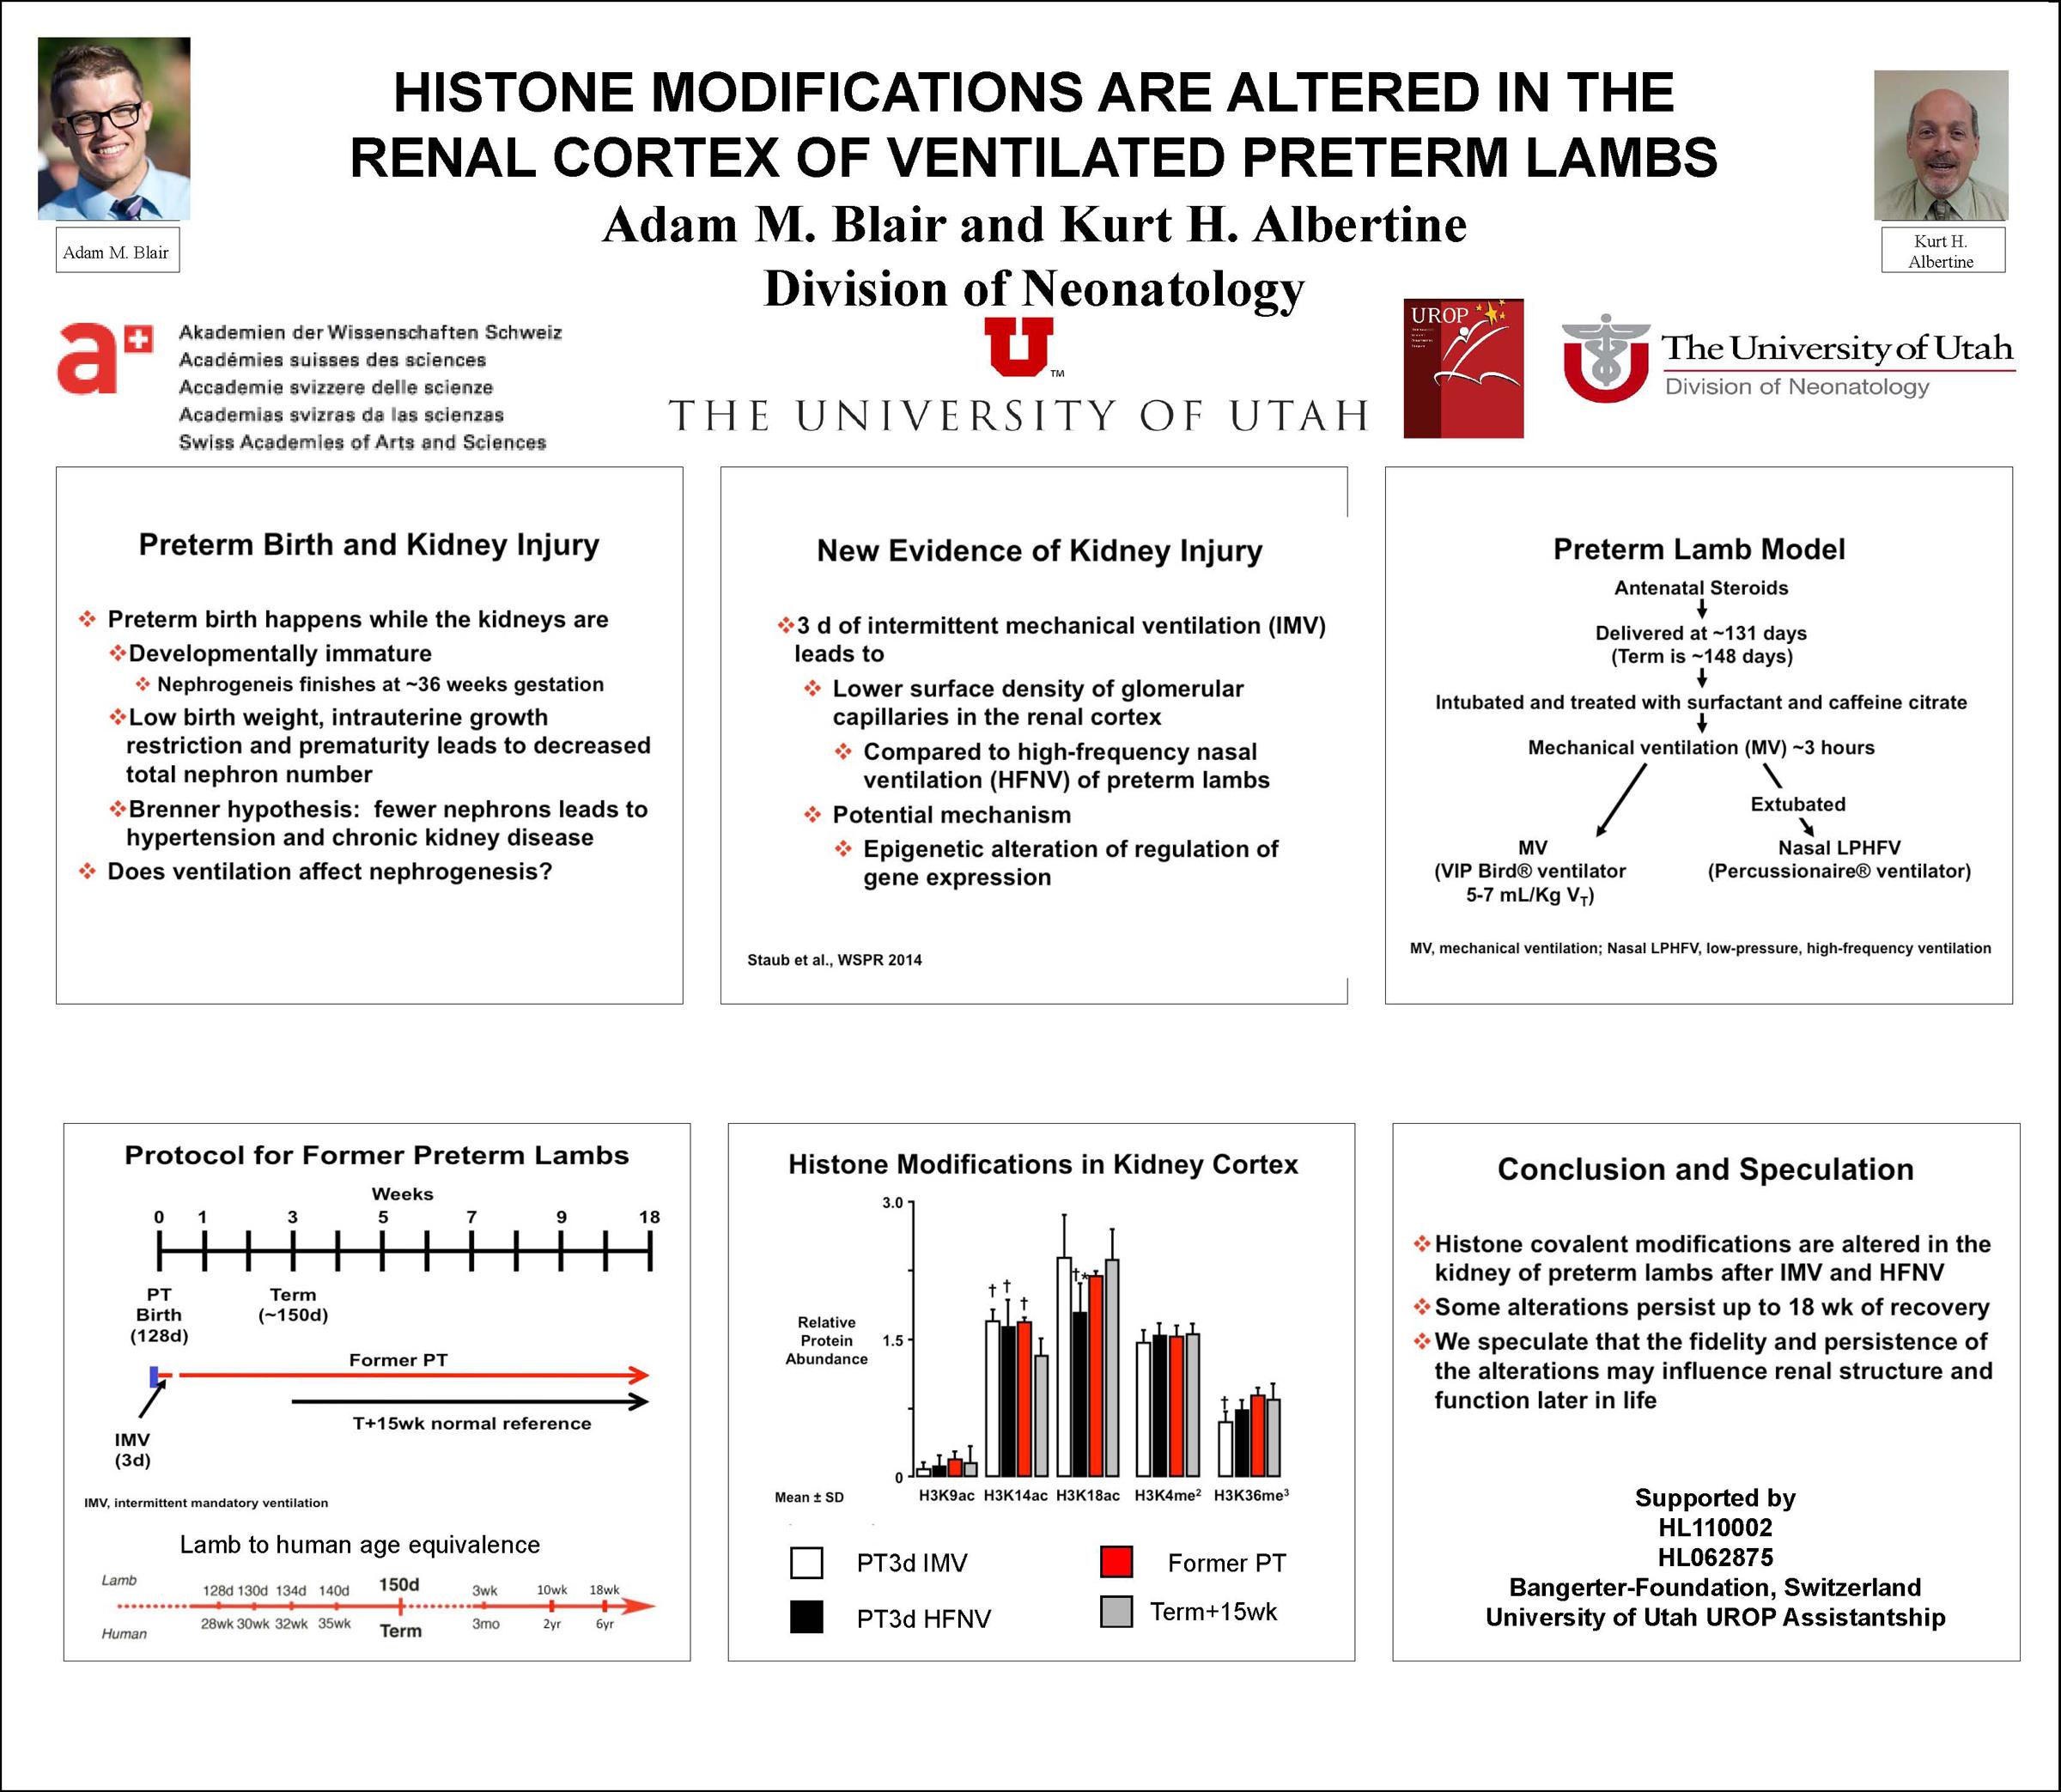 Histone modifications are altered in the renal cortex of ventilated preterm lambs.